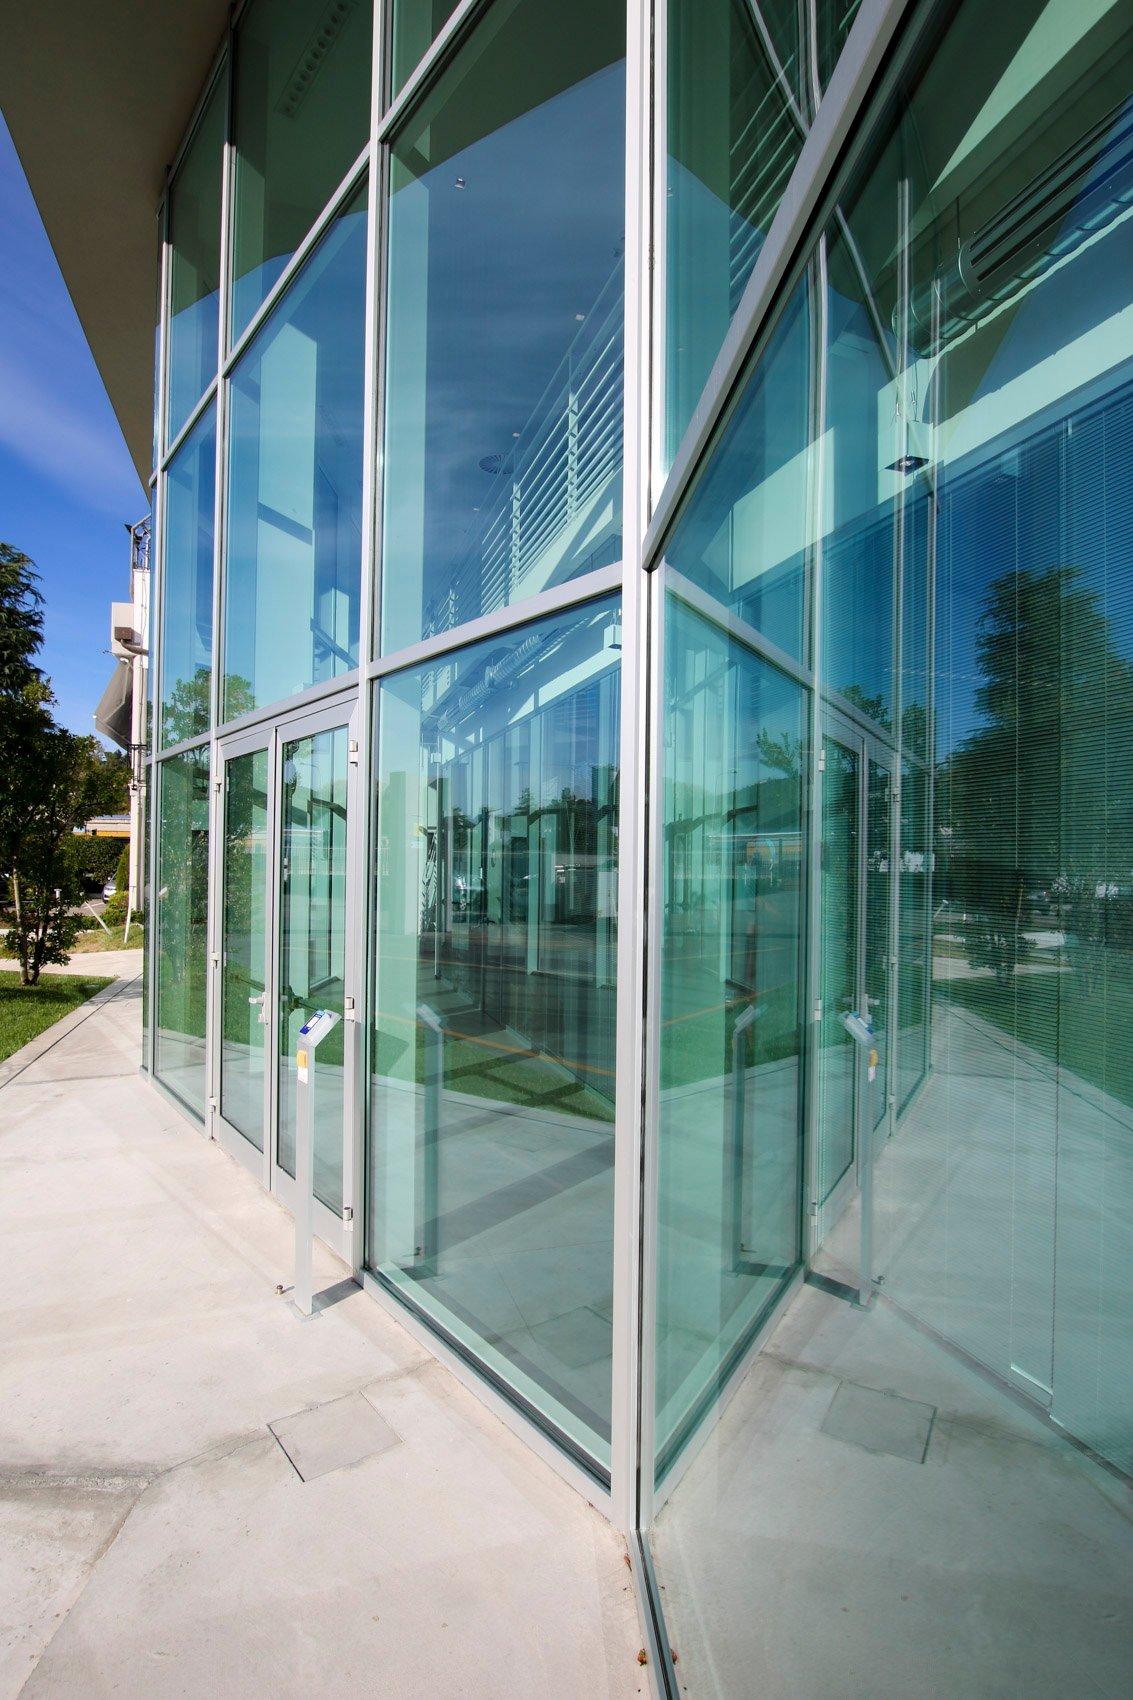 Laboratorio chimico Elantas Europe ad Ascoli Piceno © Lorenzo Bartoli, courtesy Saint-Gobain Glass